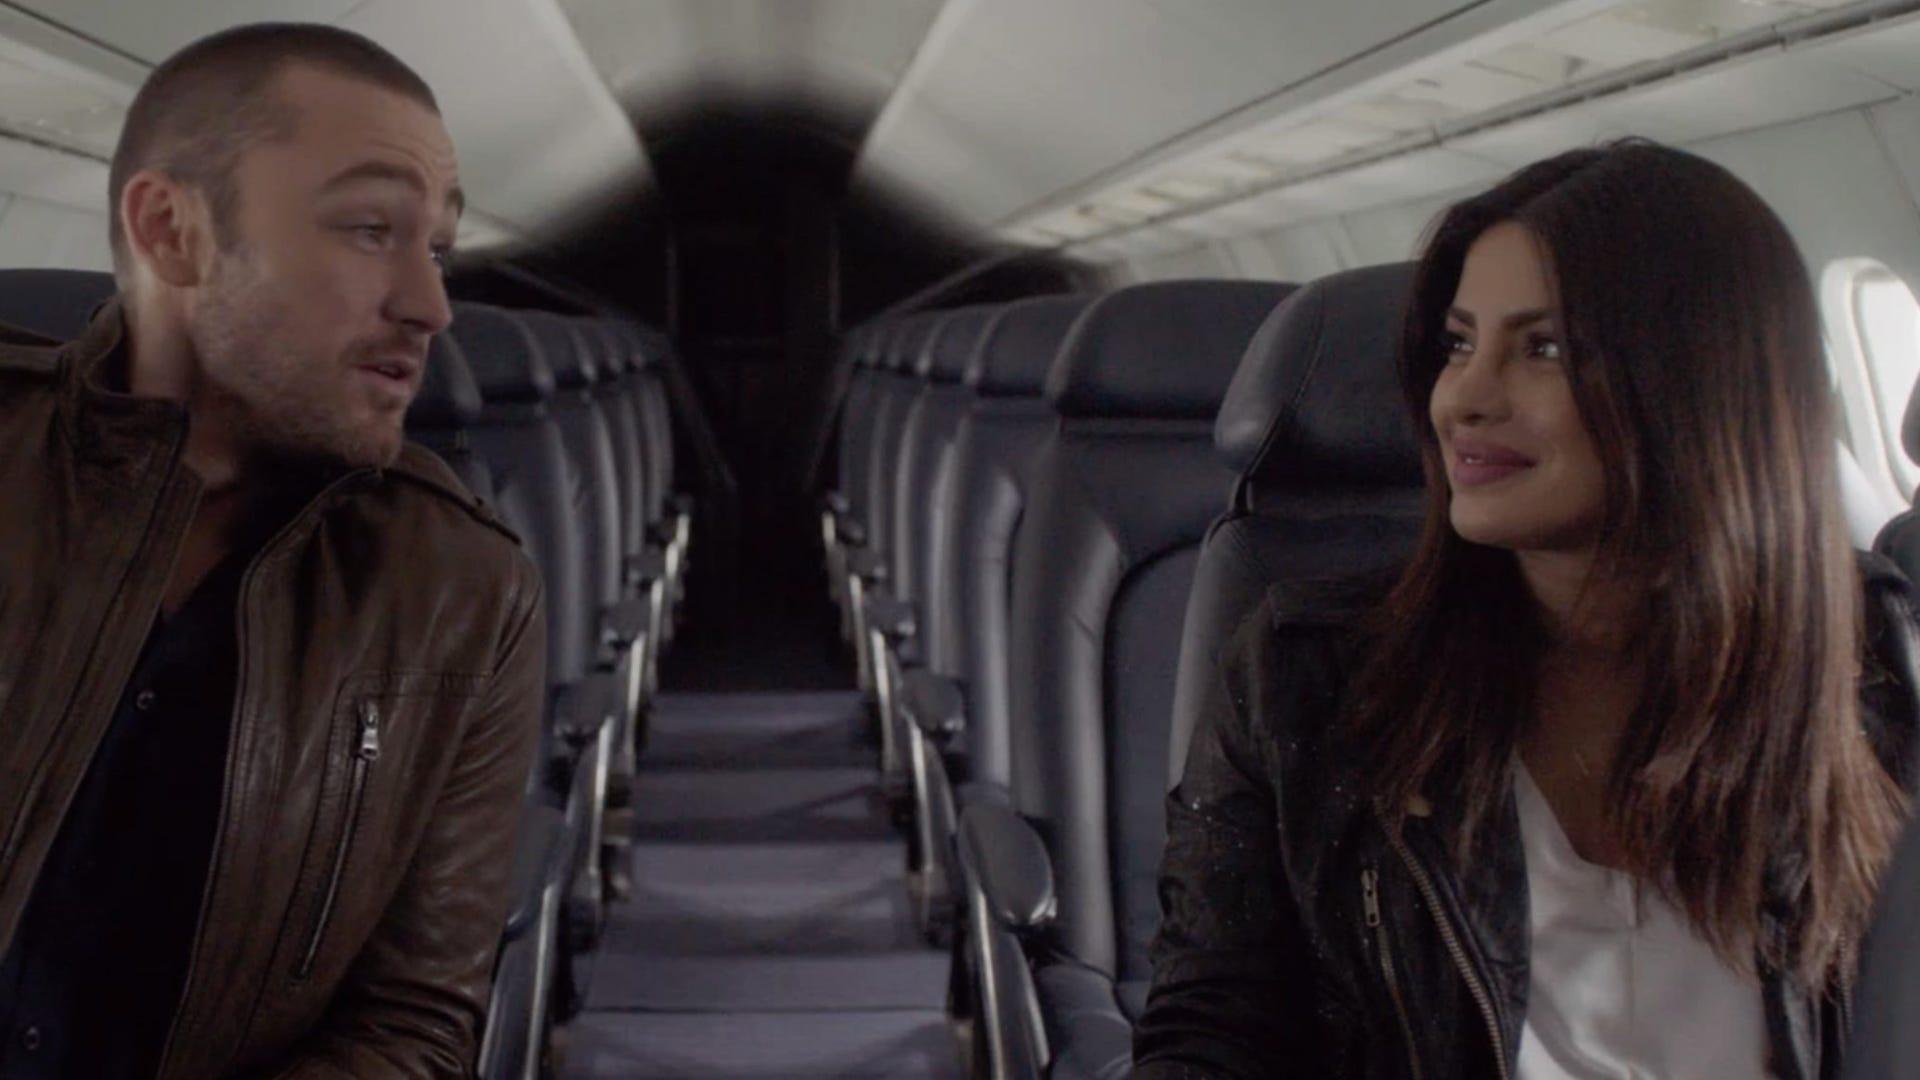 Jake McLaughlin and Priyanka Chopra, Quantico